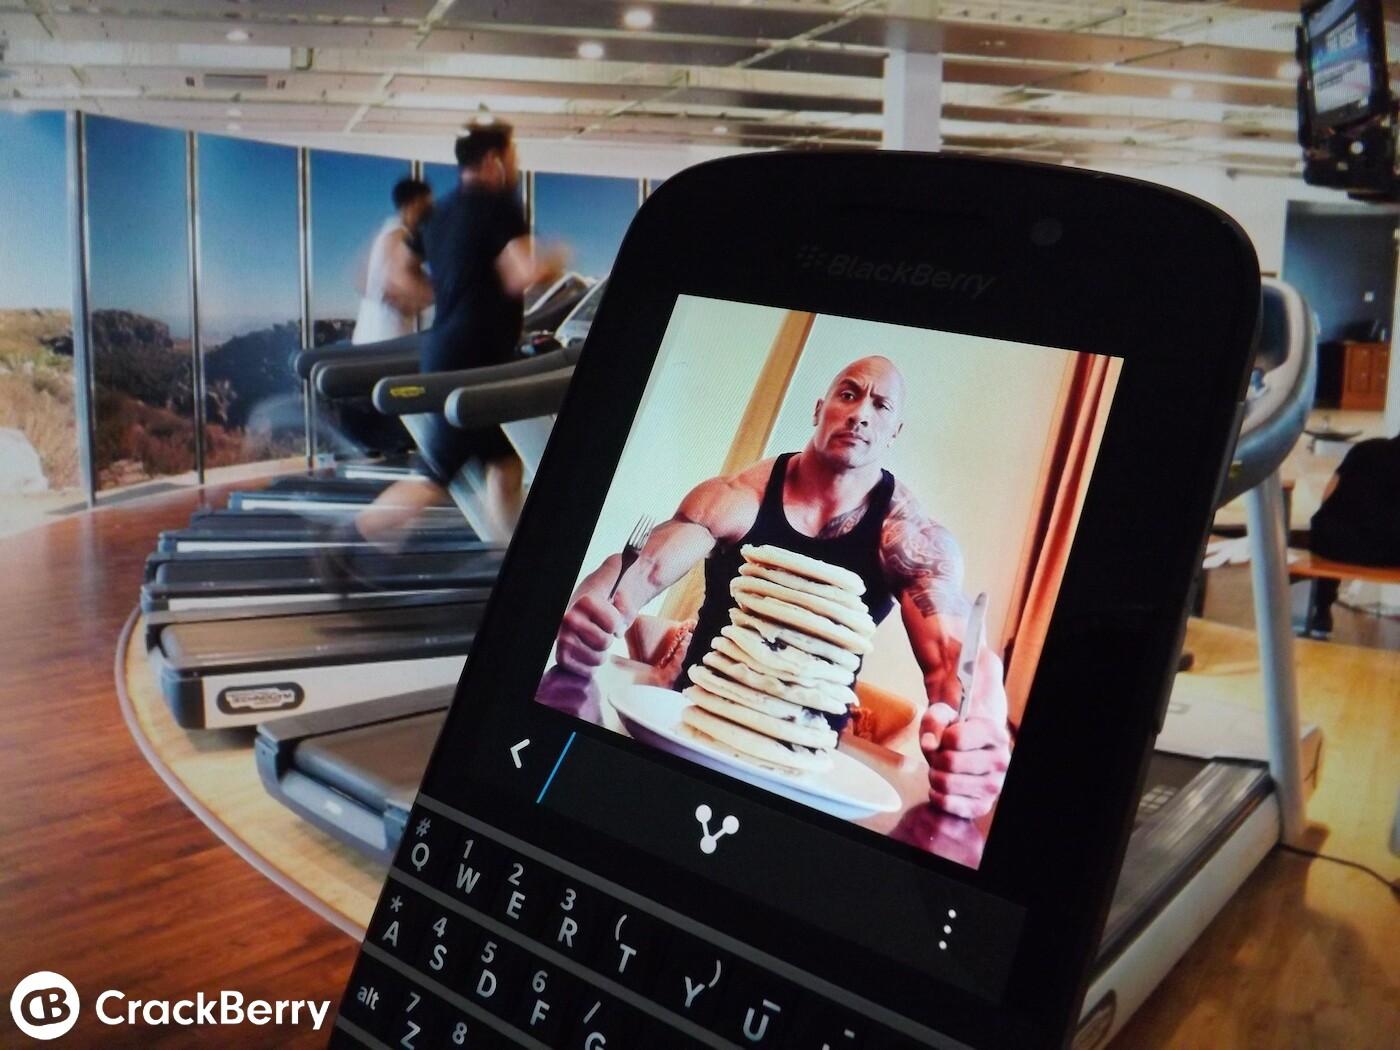 calorie counter app for blackberry z10